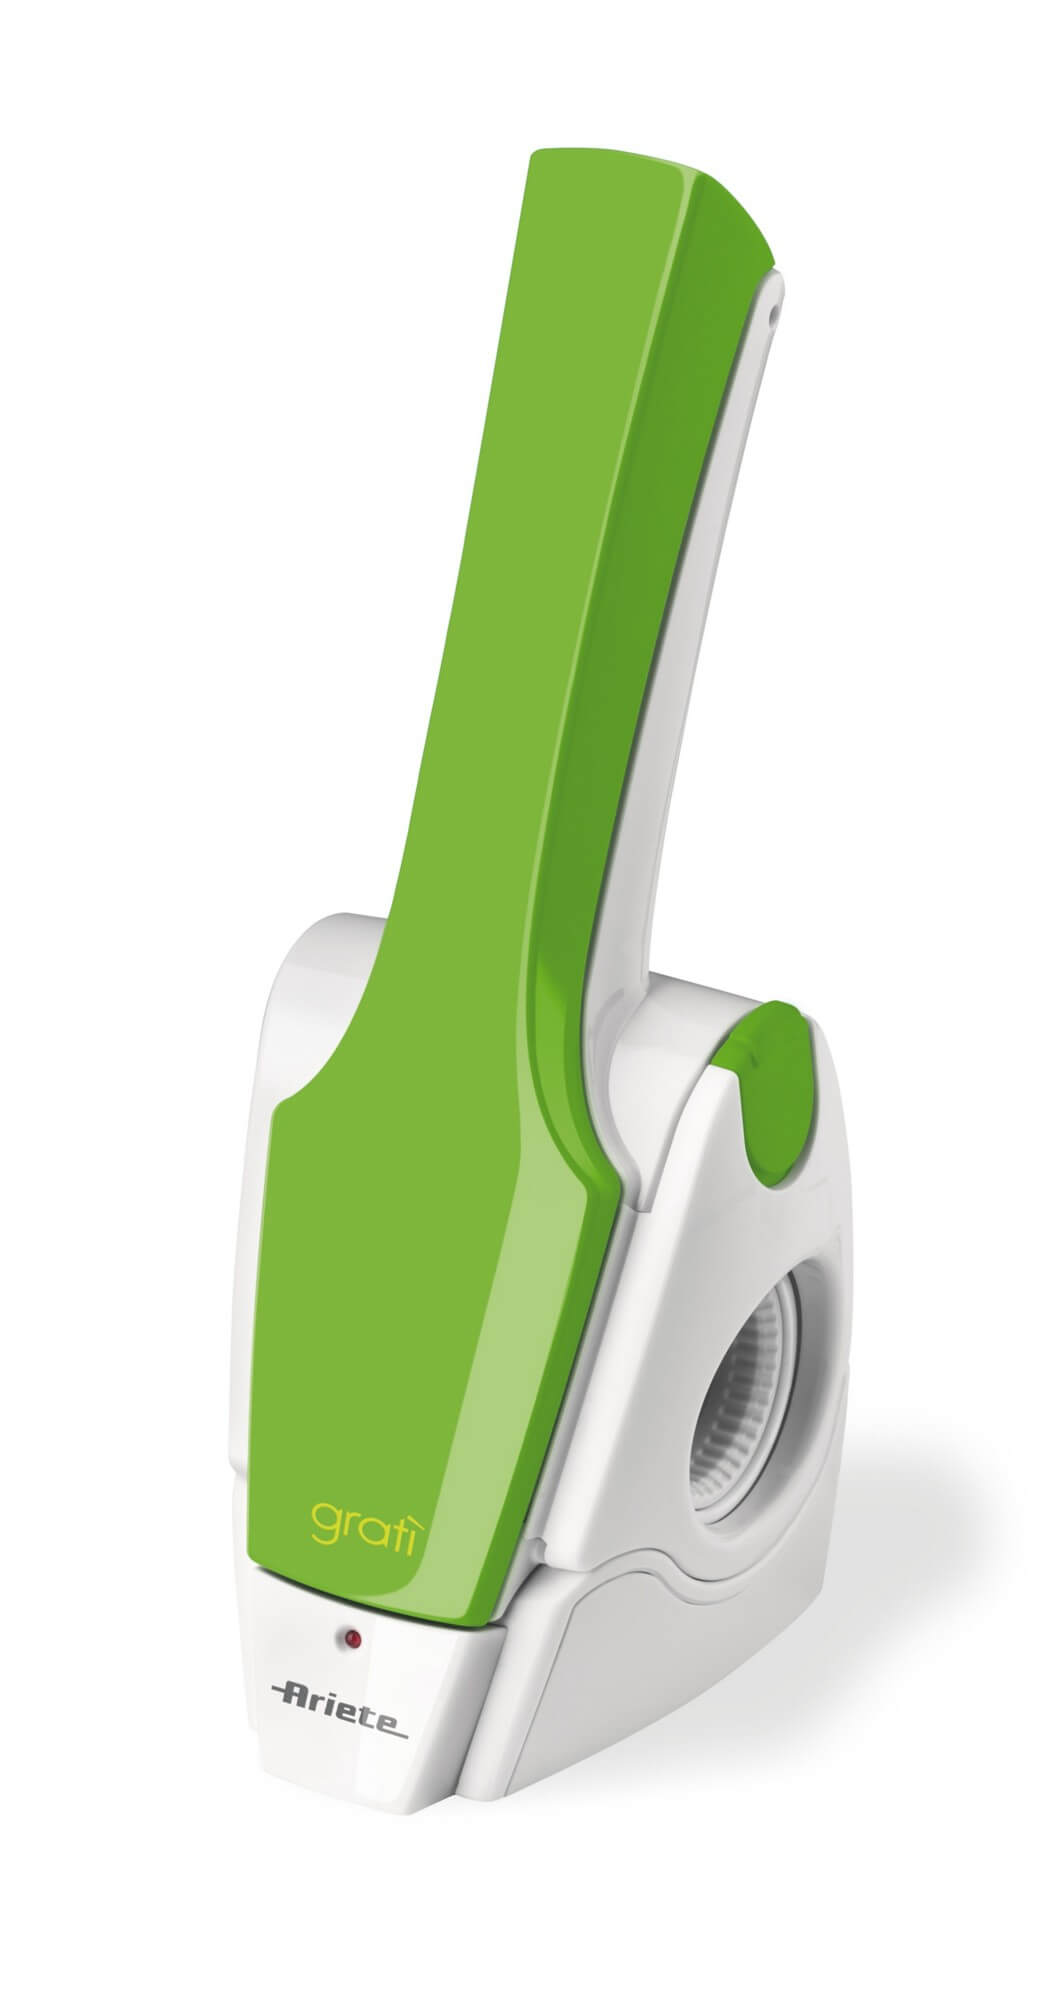 Gratì 2.0 Verde